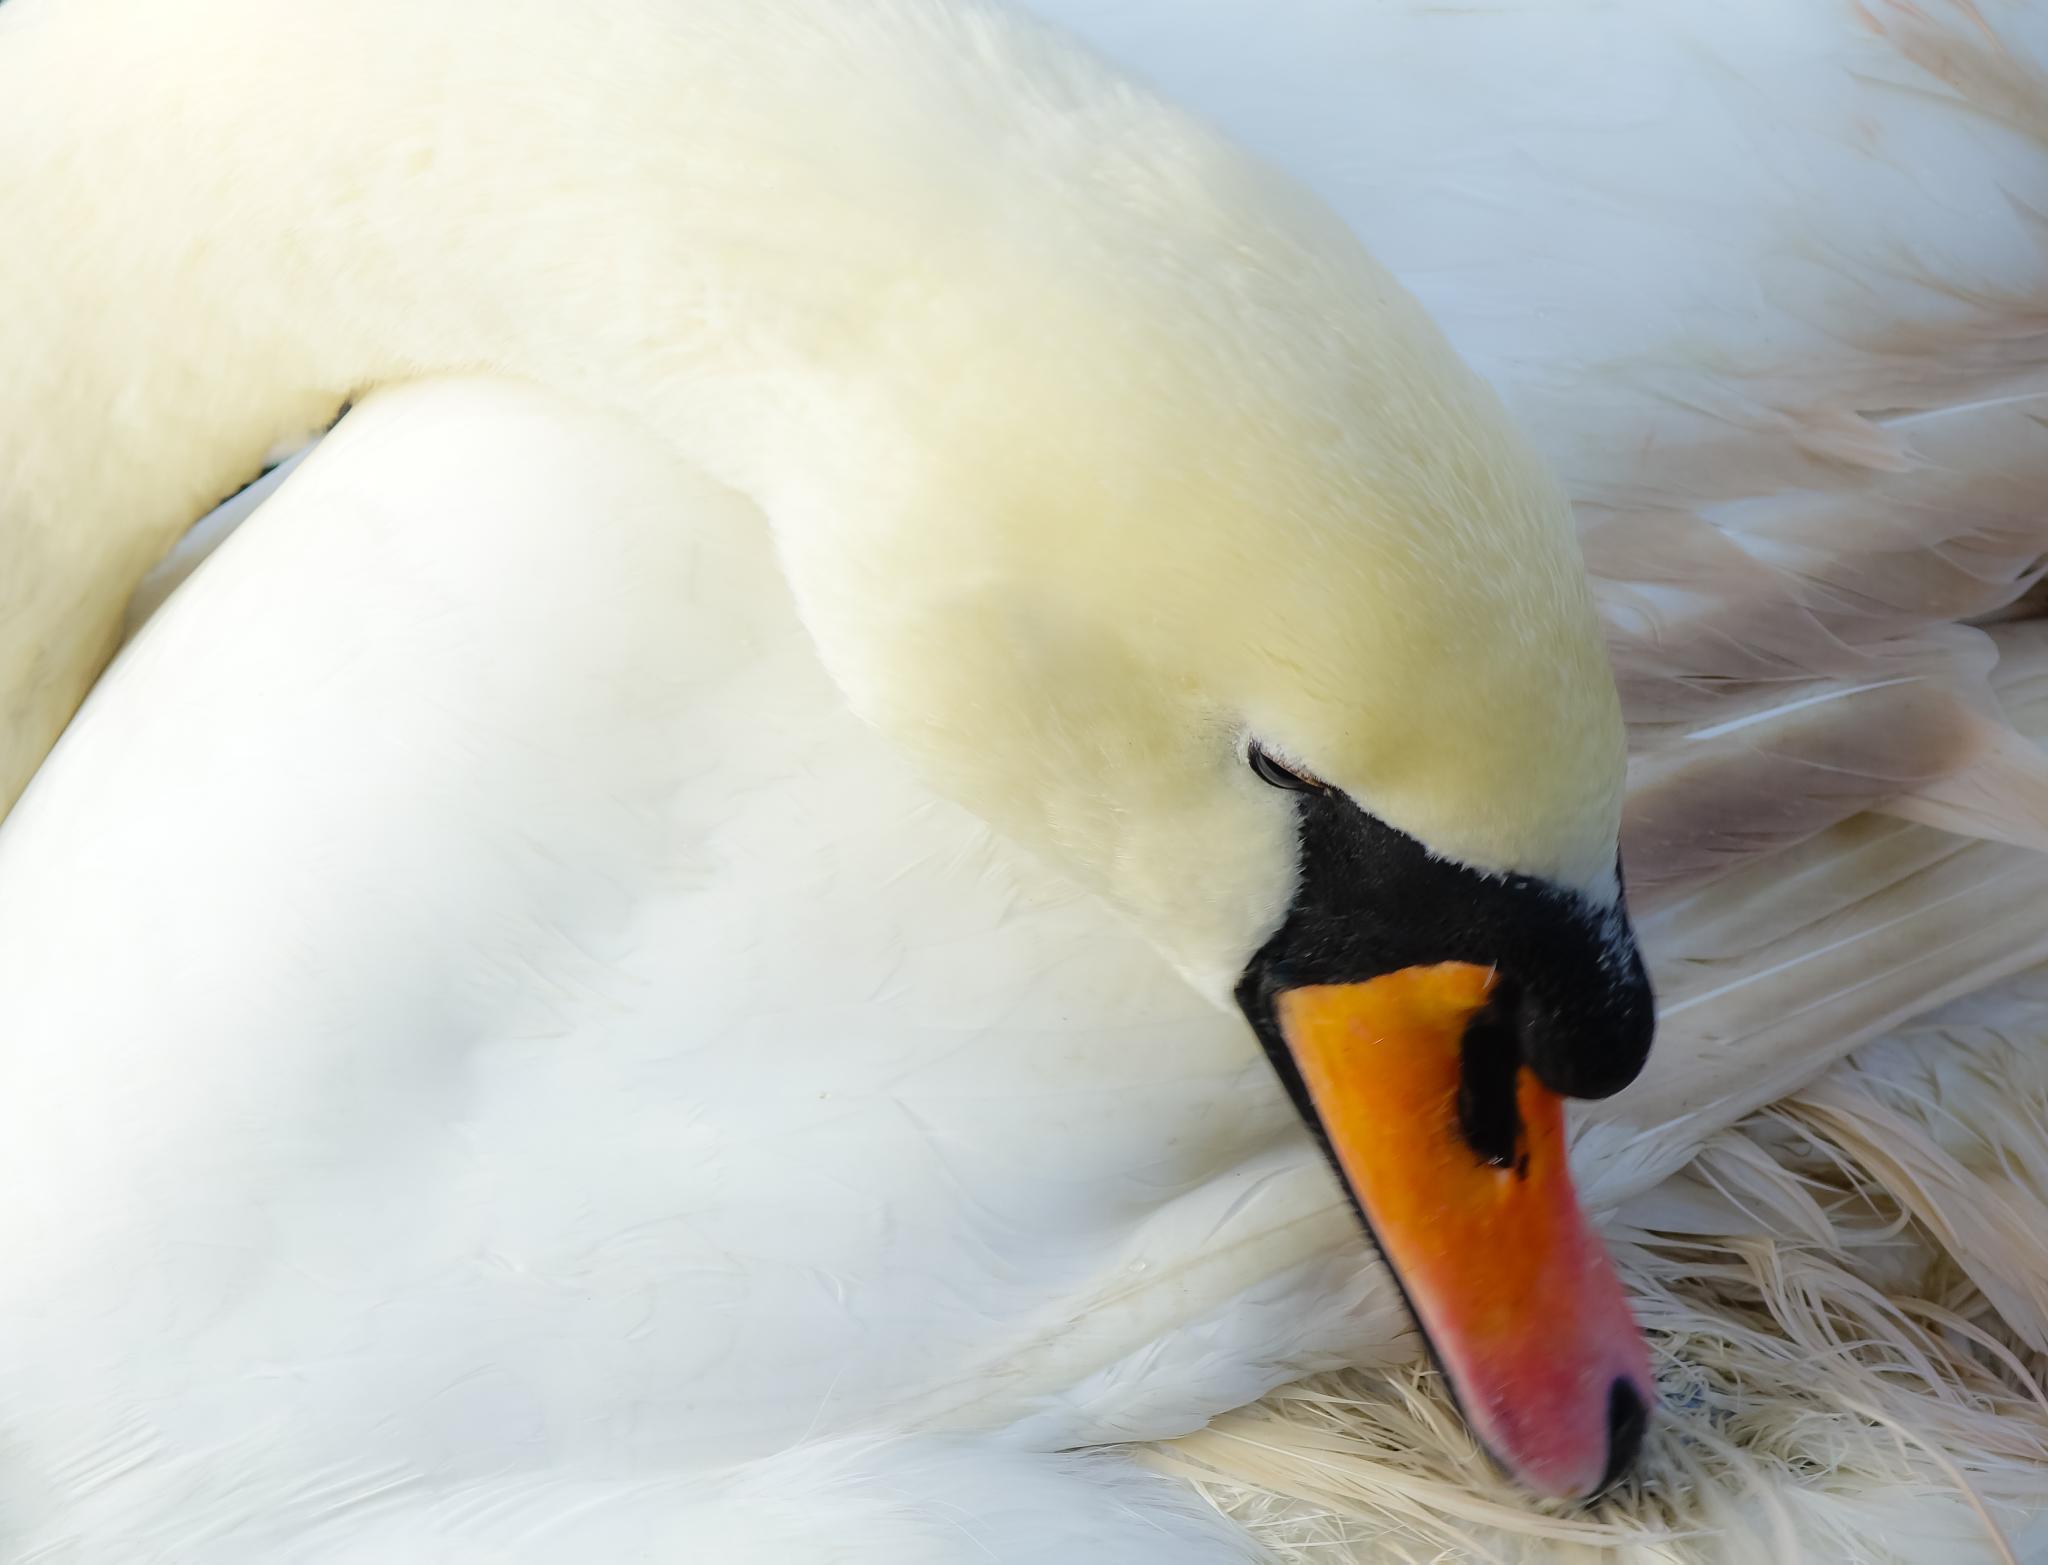 Swan by Peter Edwardo Vicente.